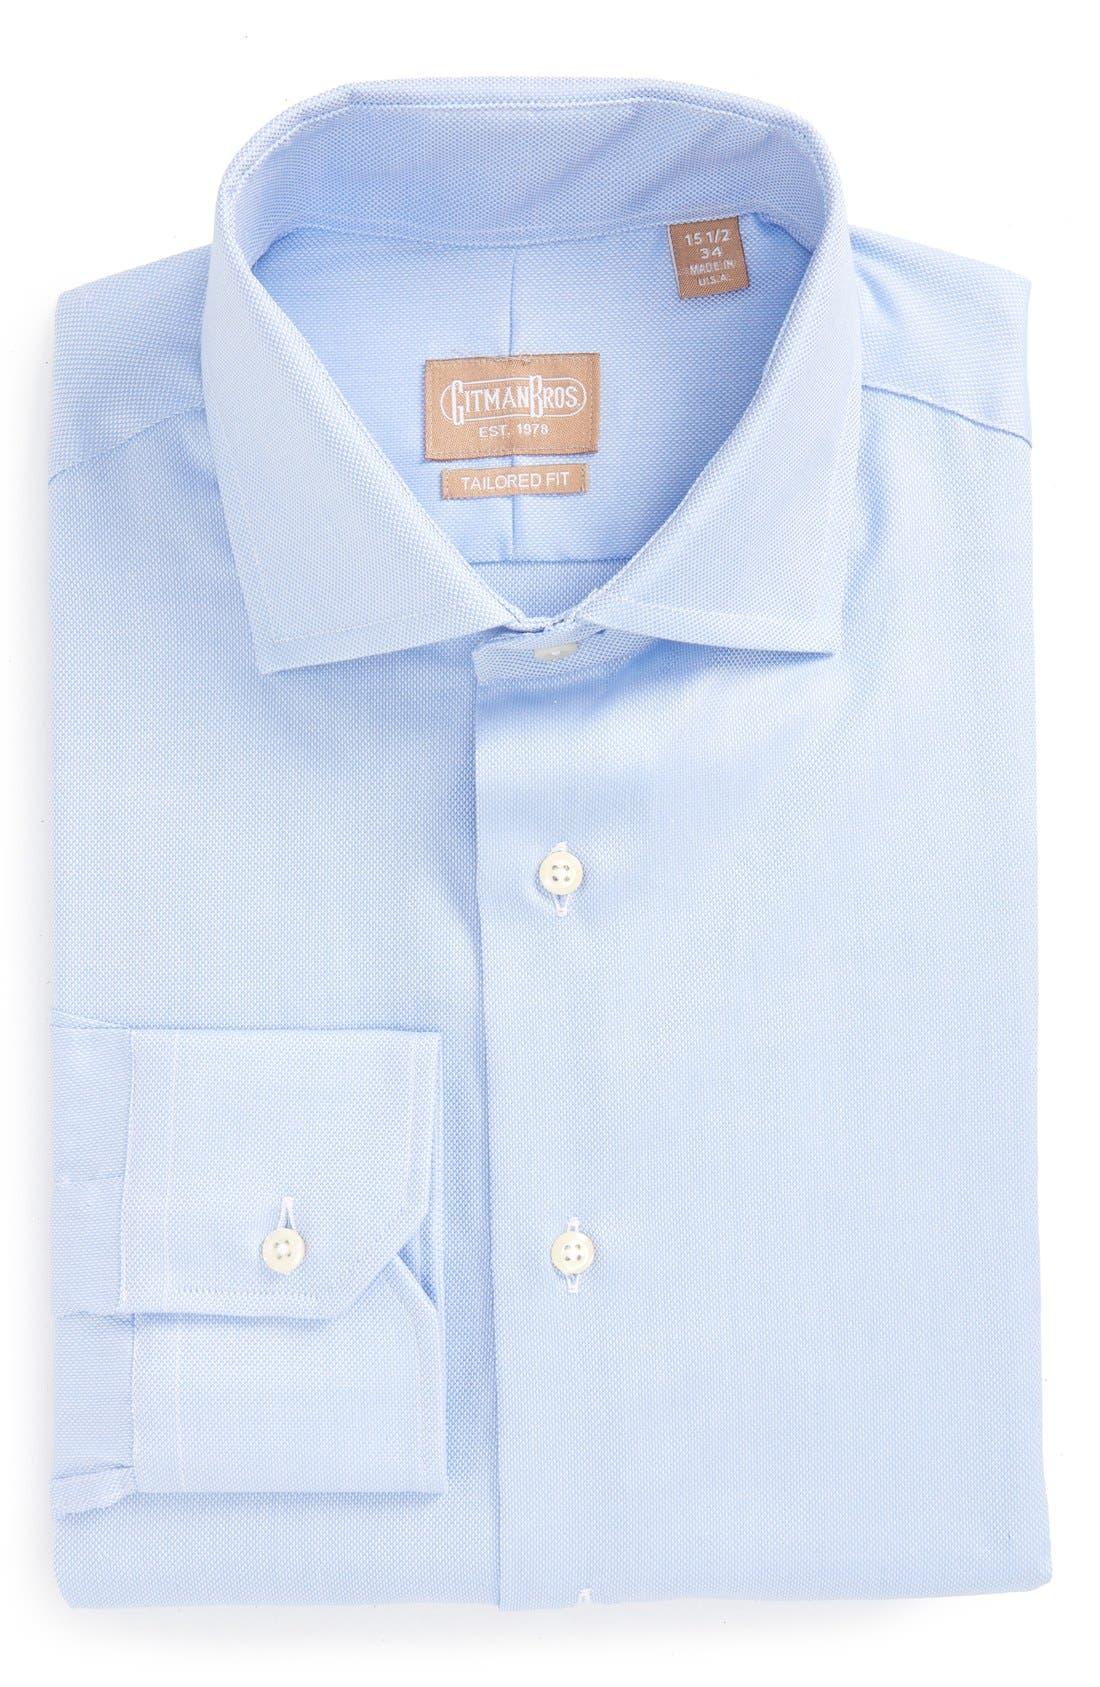 Royal Oxford Tailored Fit Dress Shirt,                             Main thumbnail 1, color,                             BLUE